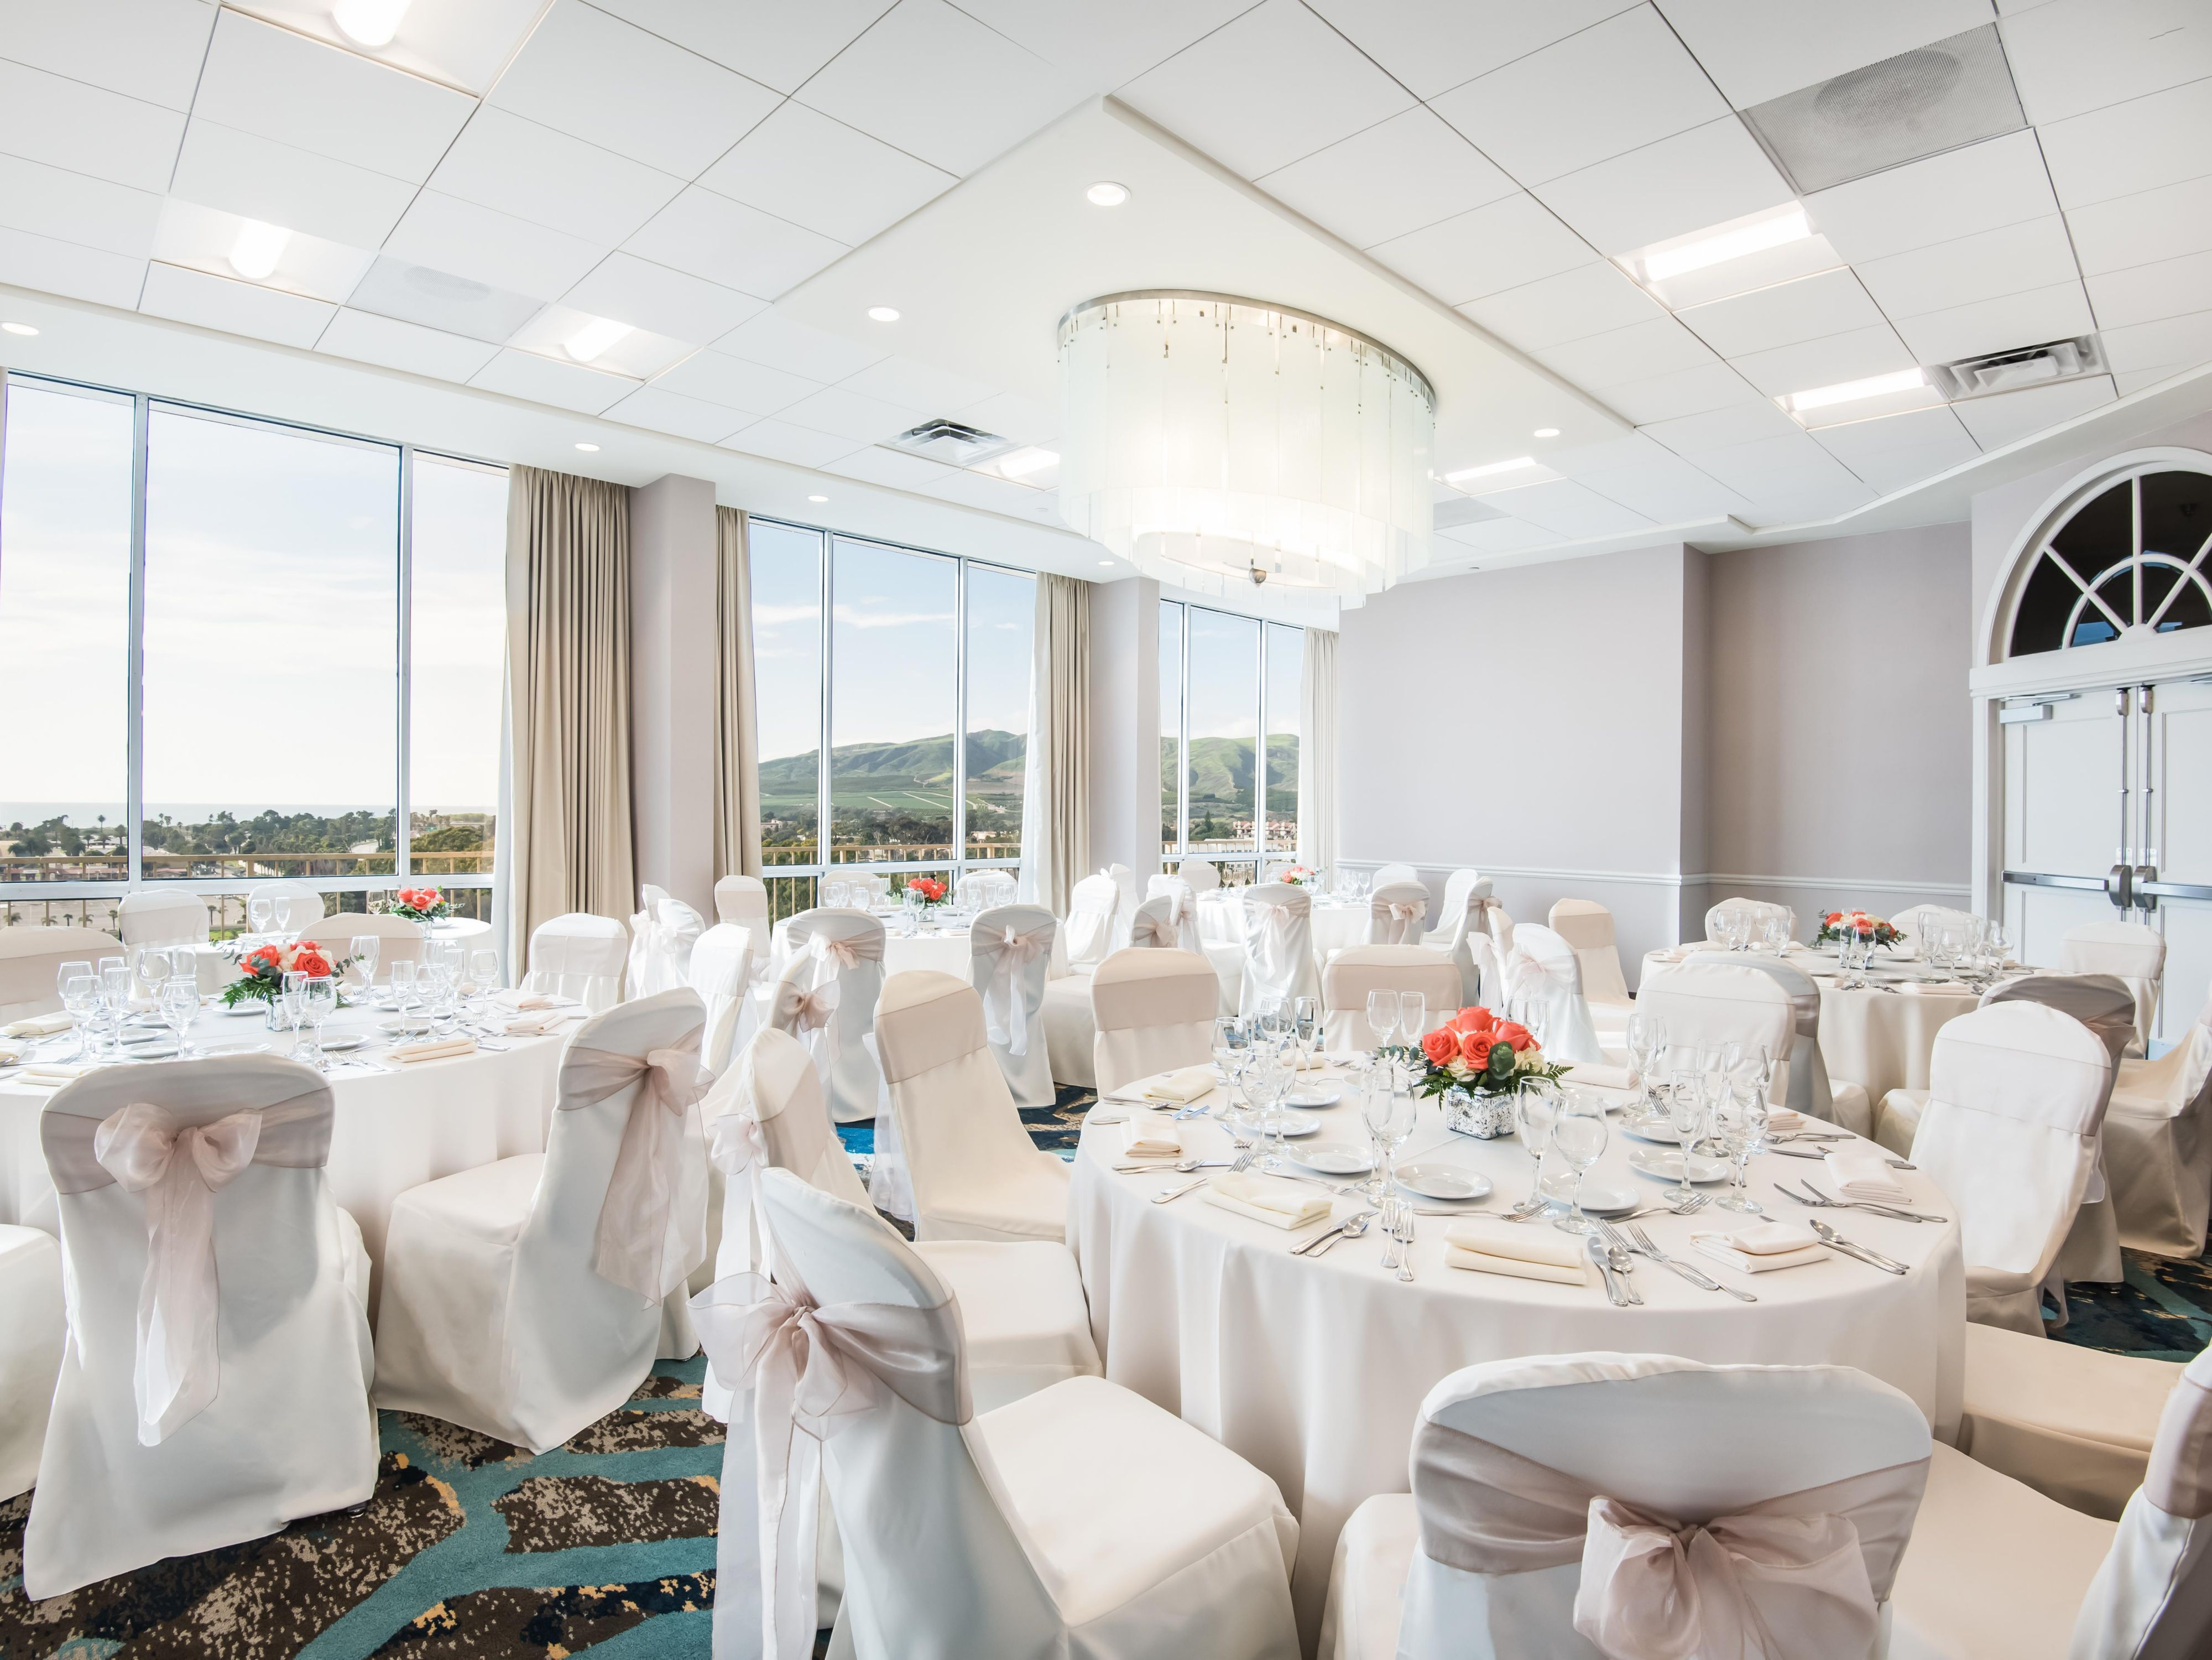 Banquetroomphoto Banquet Room Crowne Plaza Ventura Beach Hotel Ballroom Specialeventsphoto